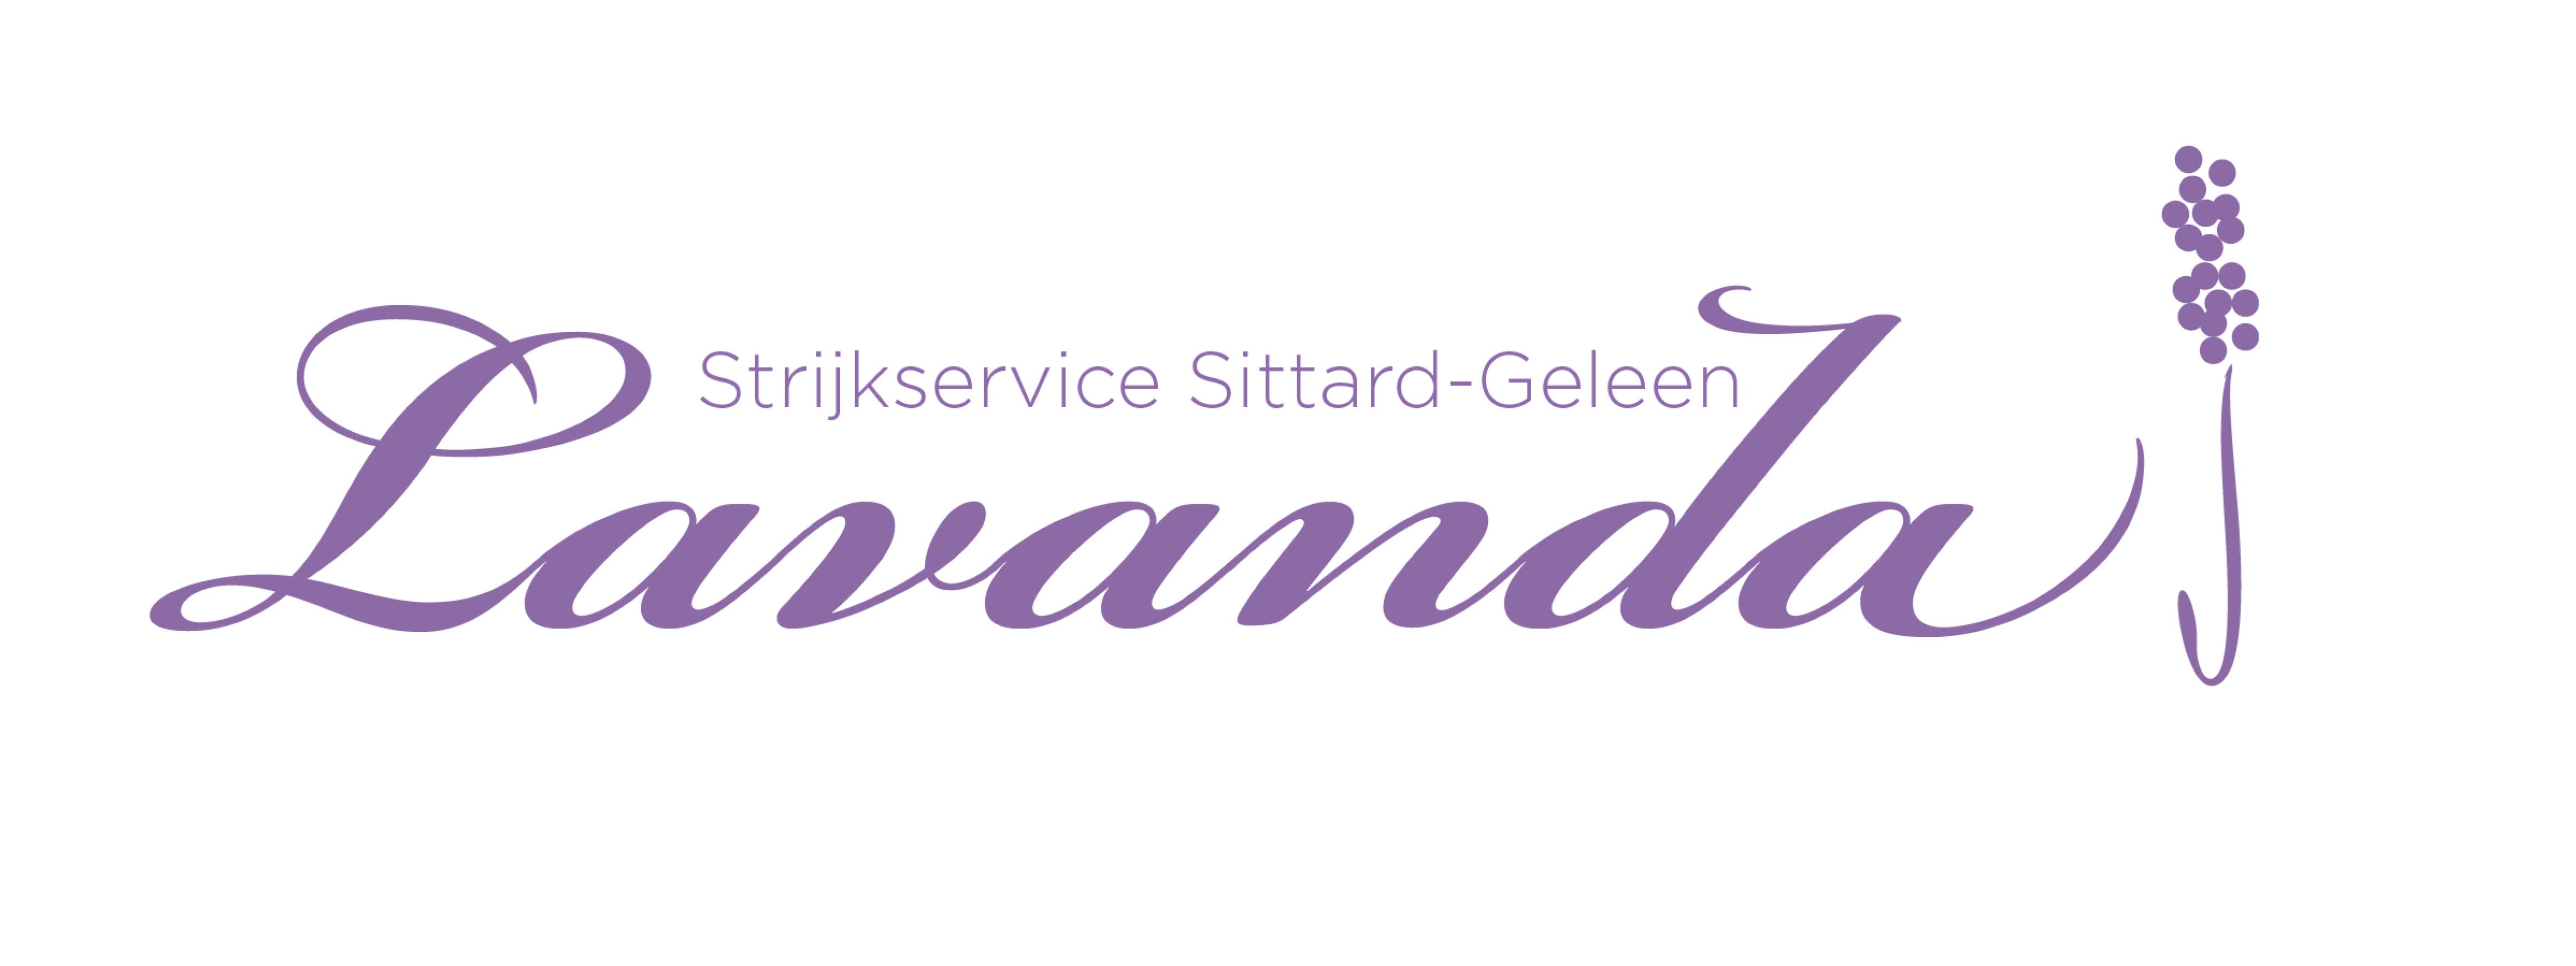 Lavanda.nu Logo